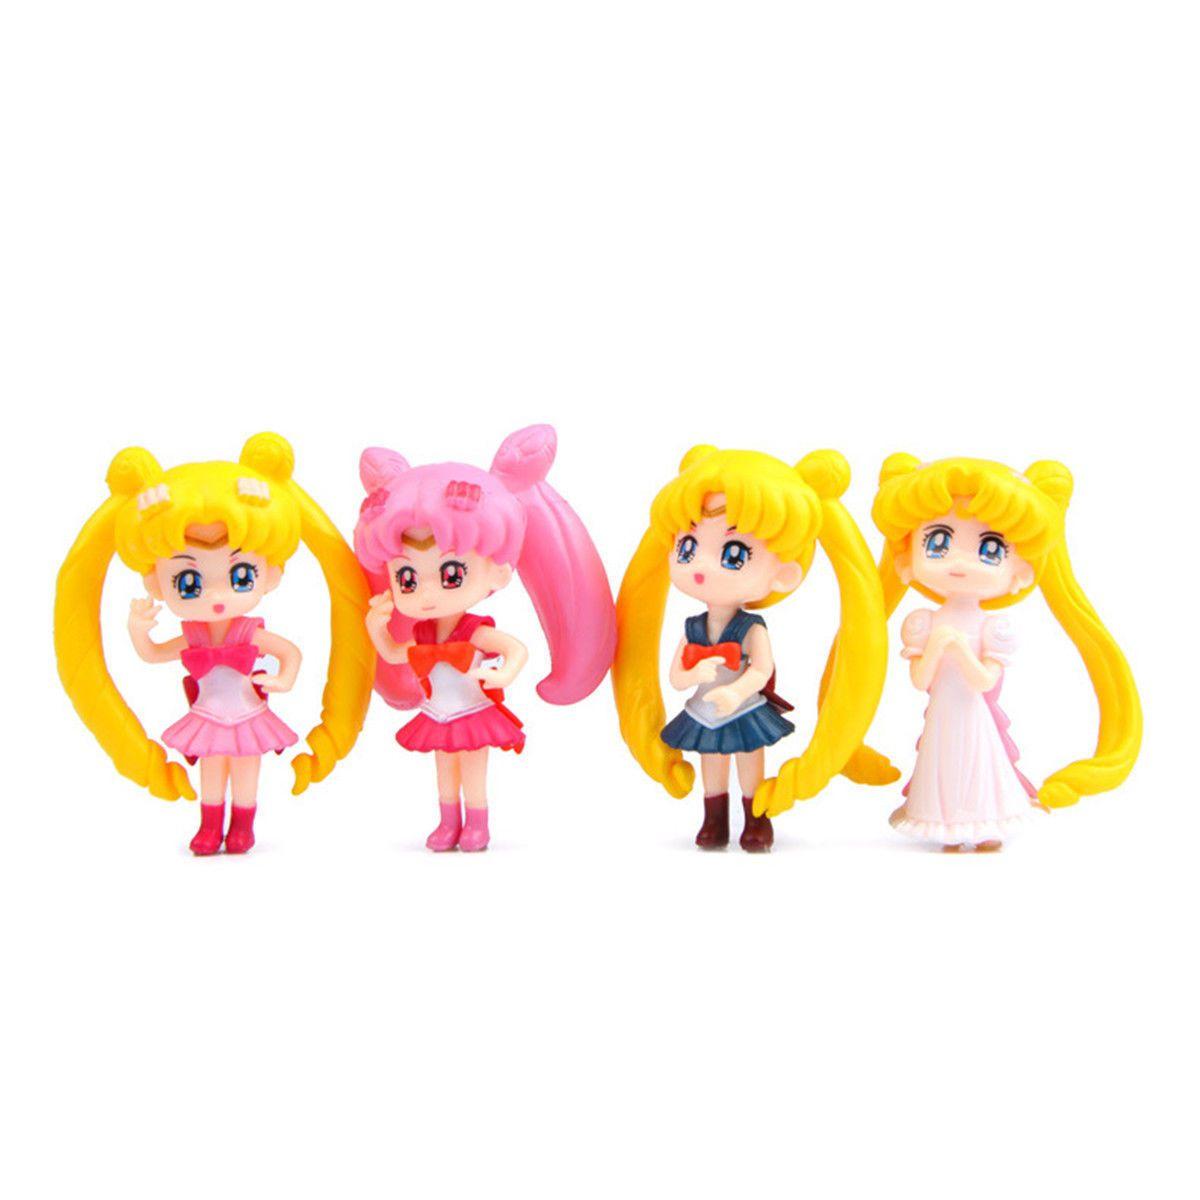 4pcs//set Anime Sailor Moon PVC Figures Figurine Model Toys